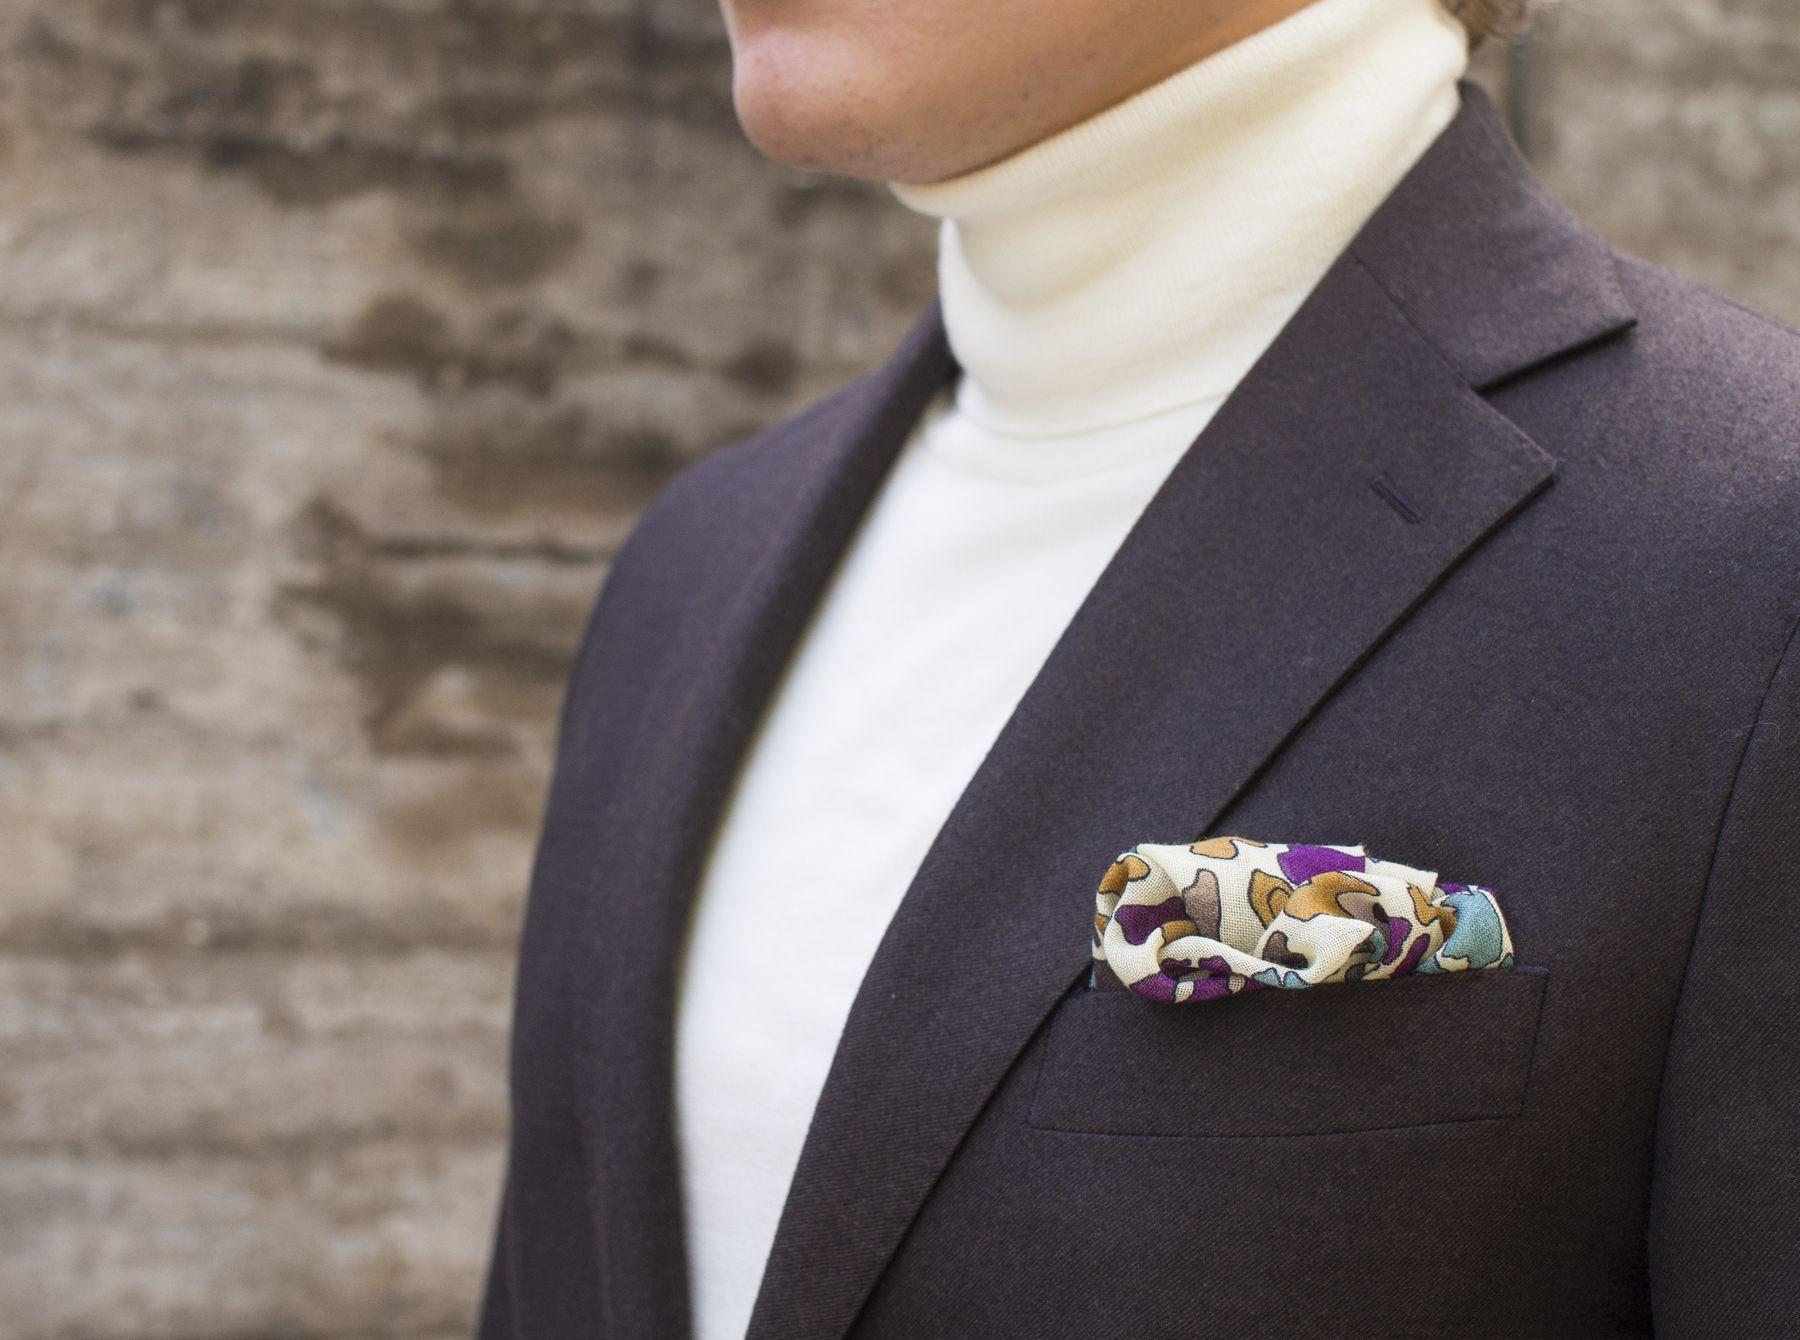 Vaatturiliike Sauma Brown Flannel Suit And Berg Berg Sweater